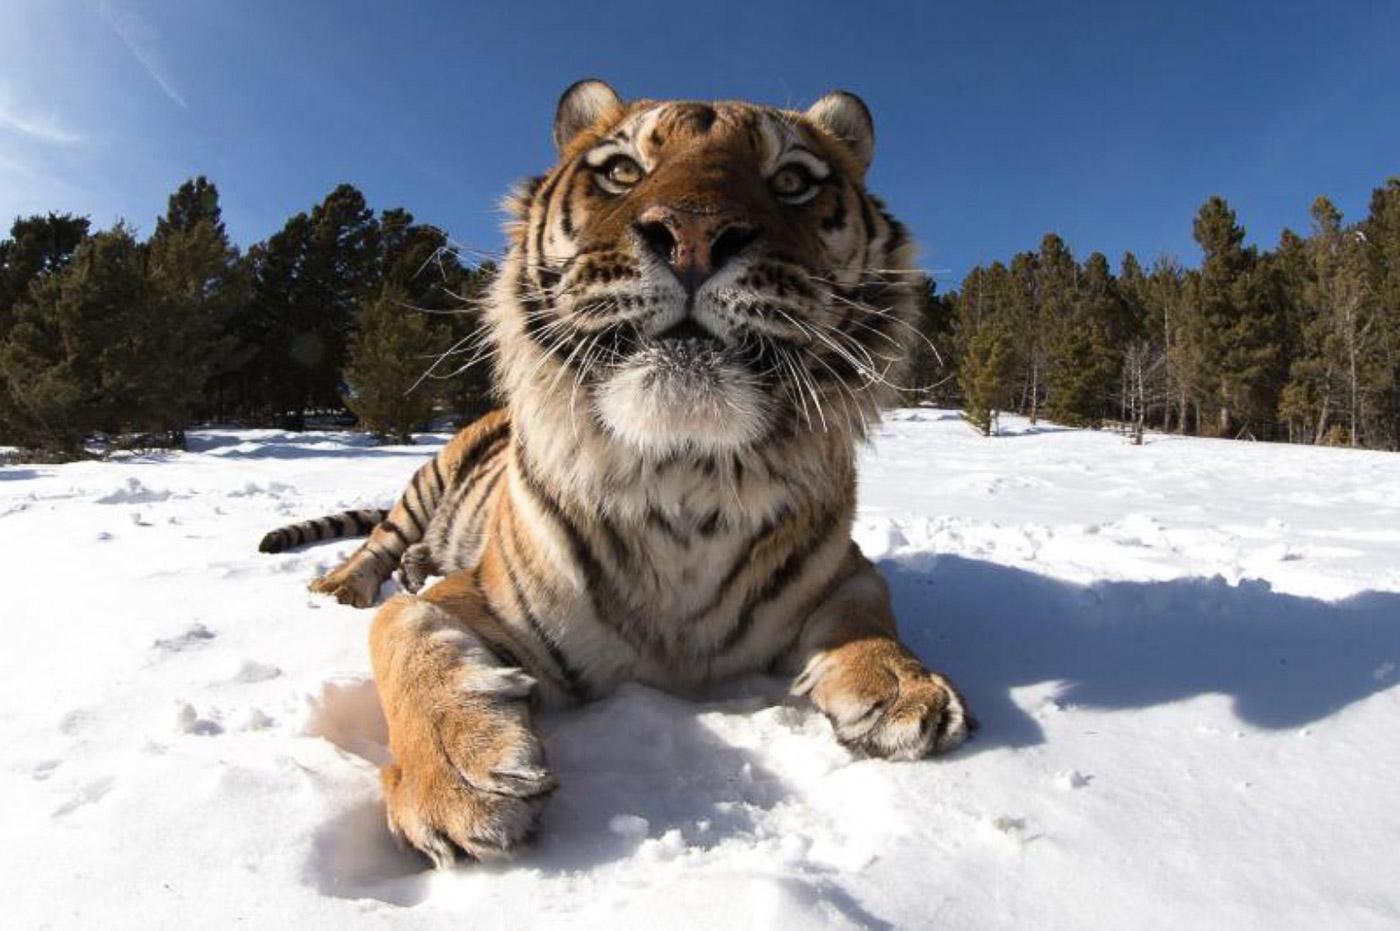 Wild cats in the snow. Photographer Michel Zogzhozhi.